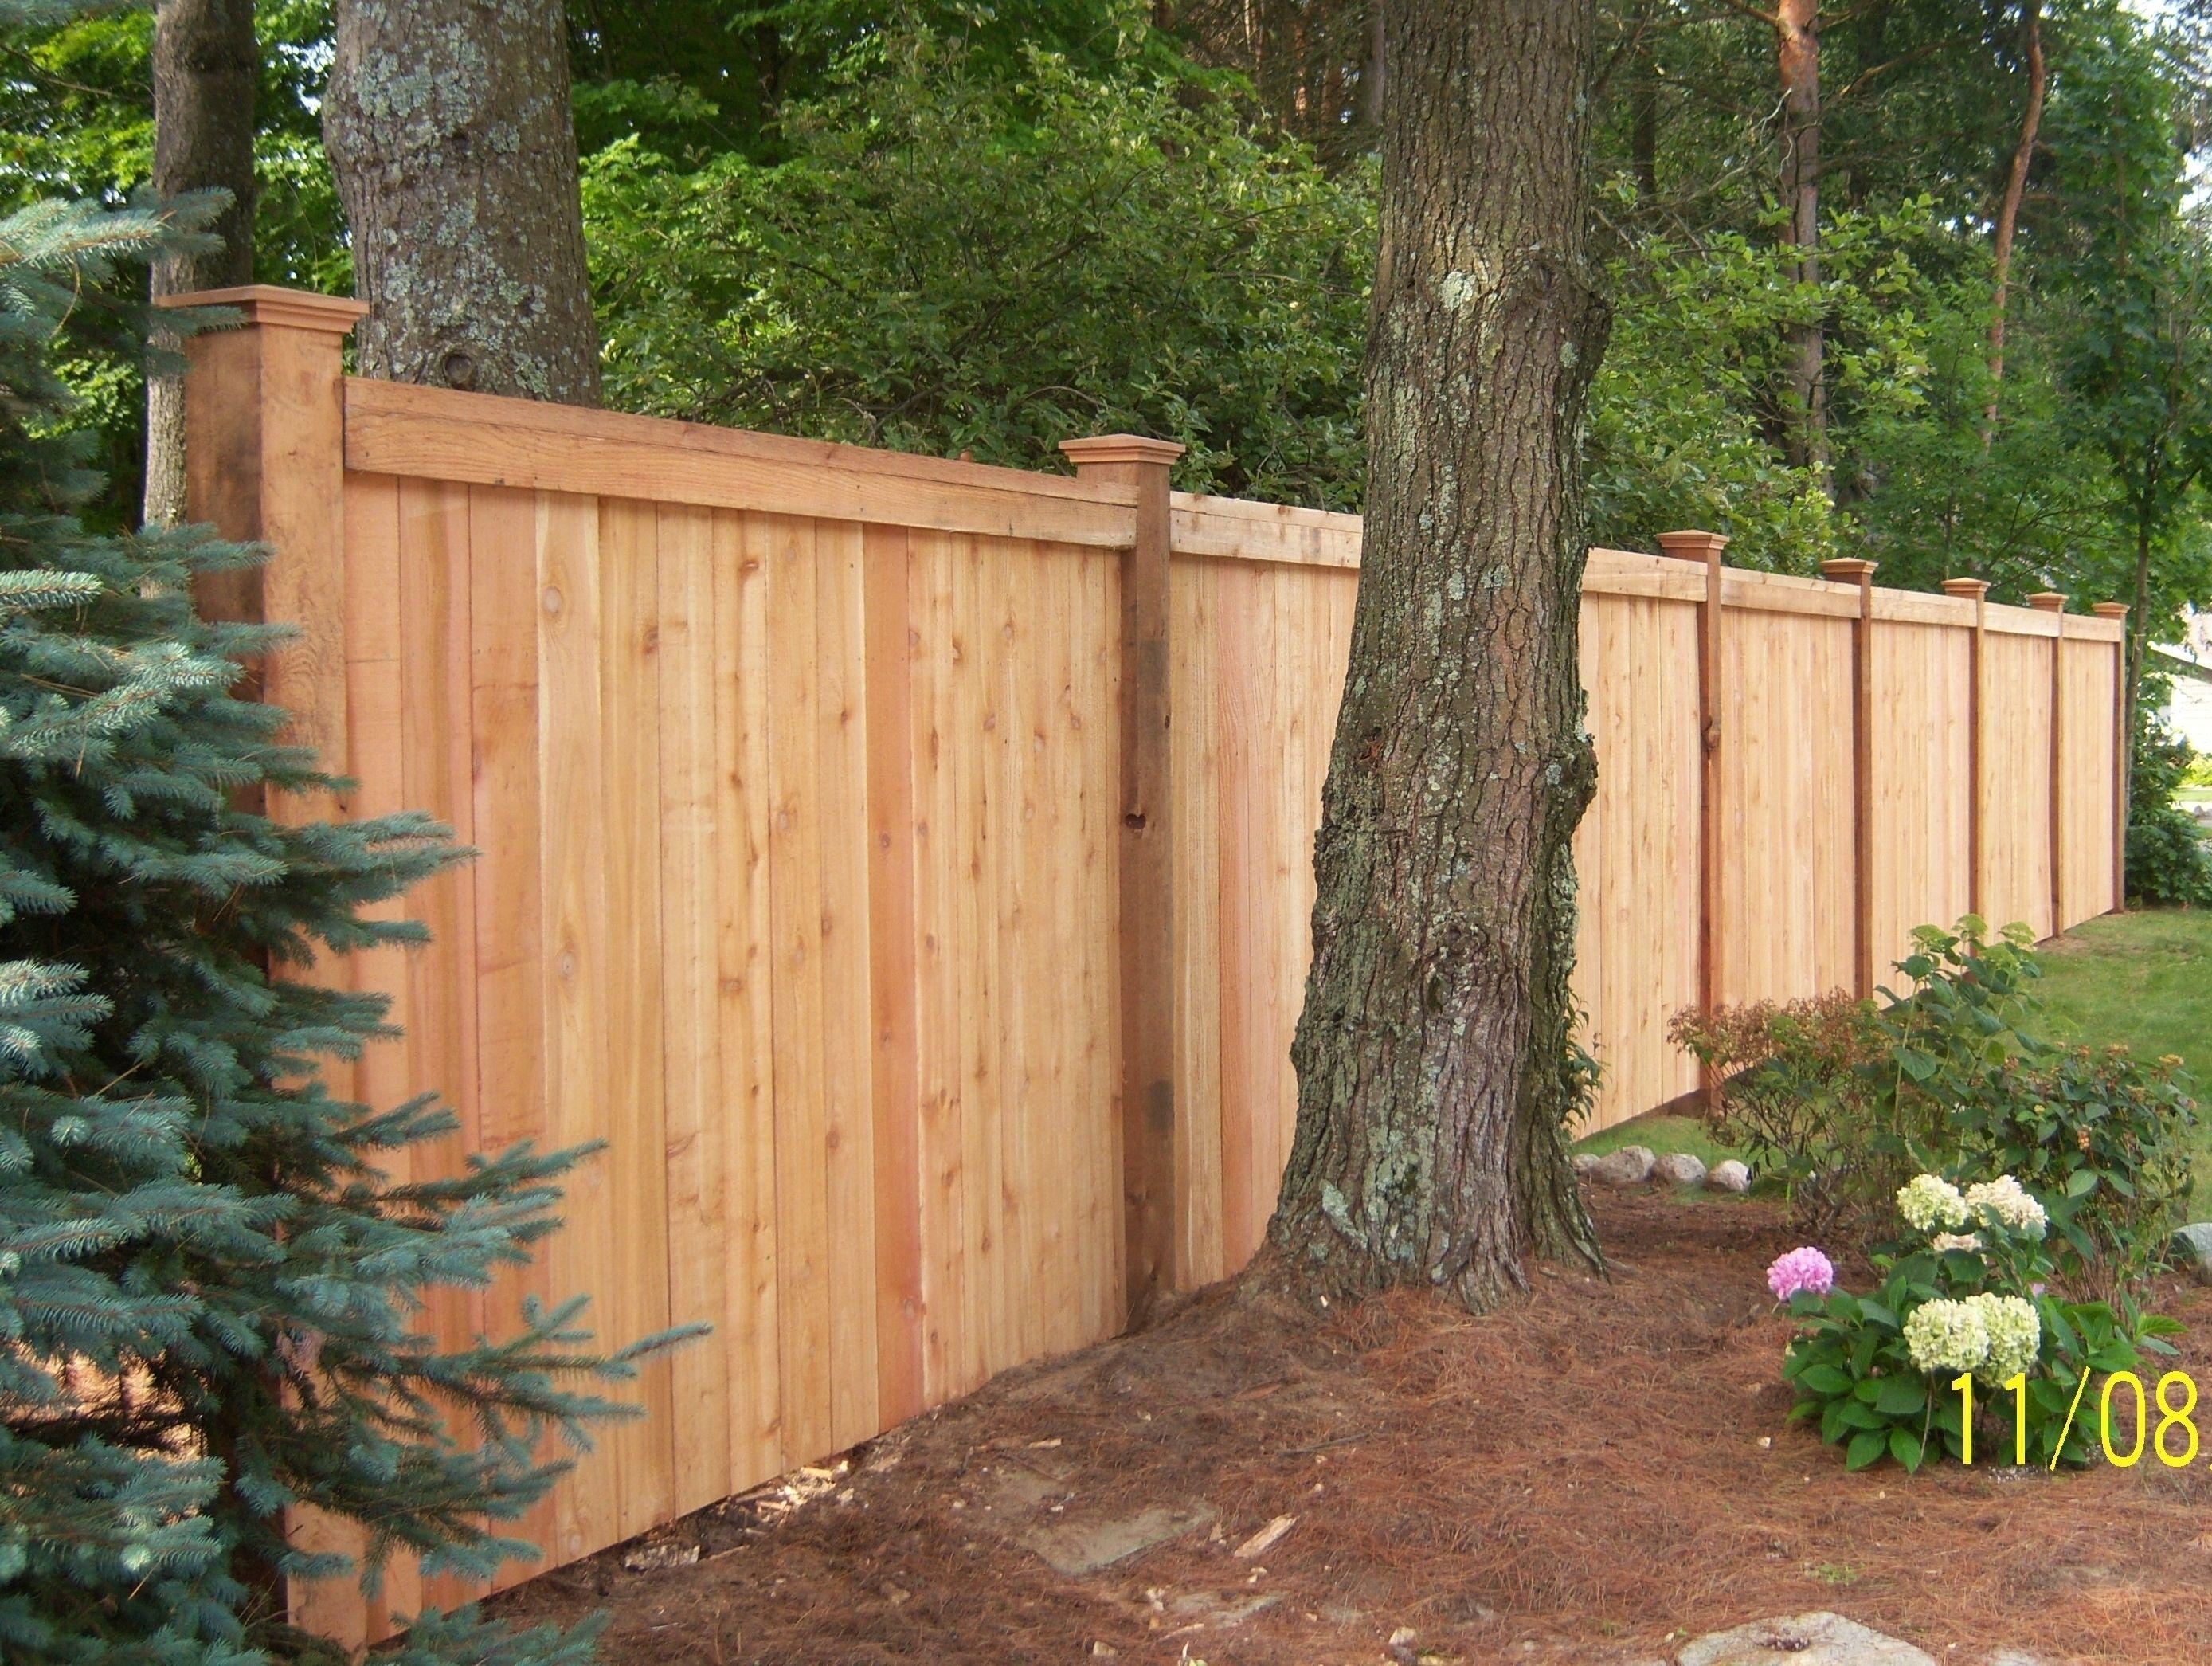 Custom wood privacy fence garden ideas pinterest for Garden fencing ideas privacy